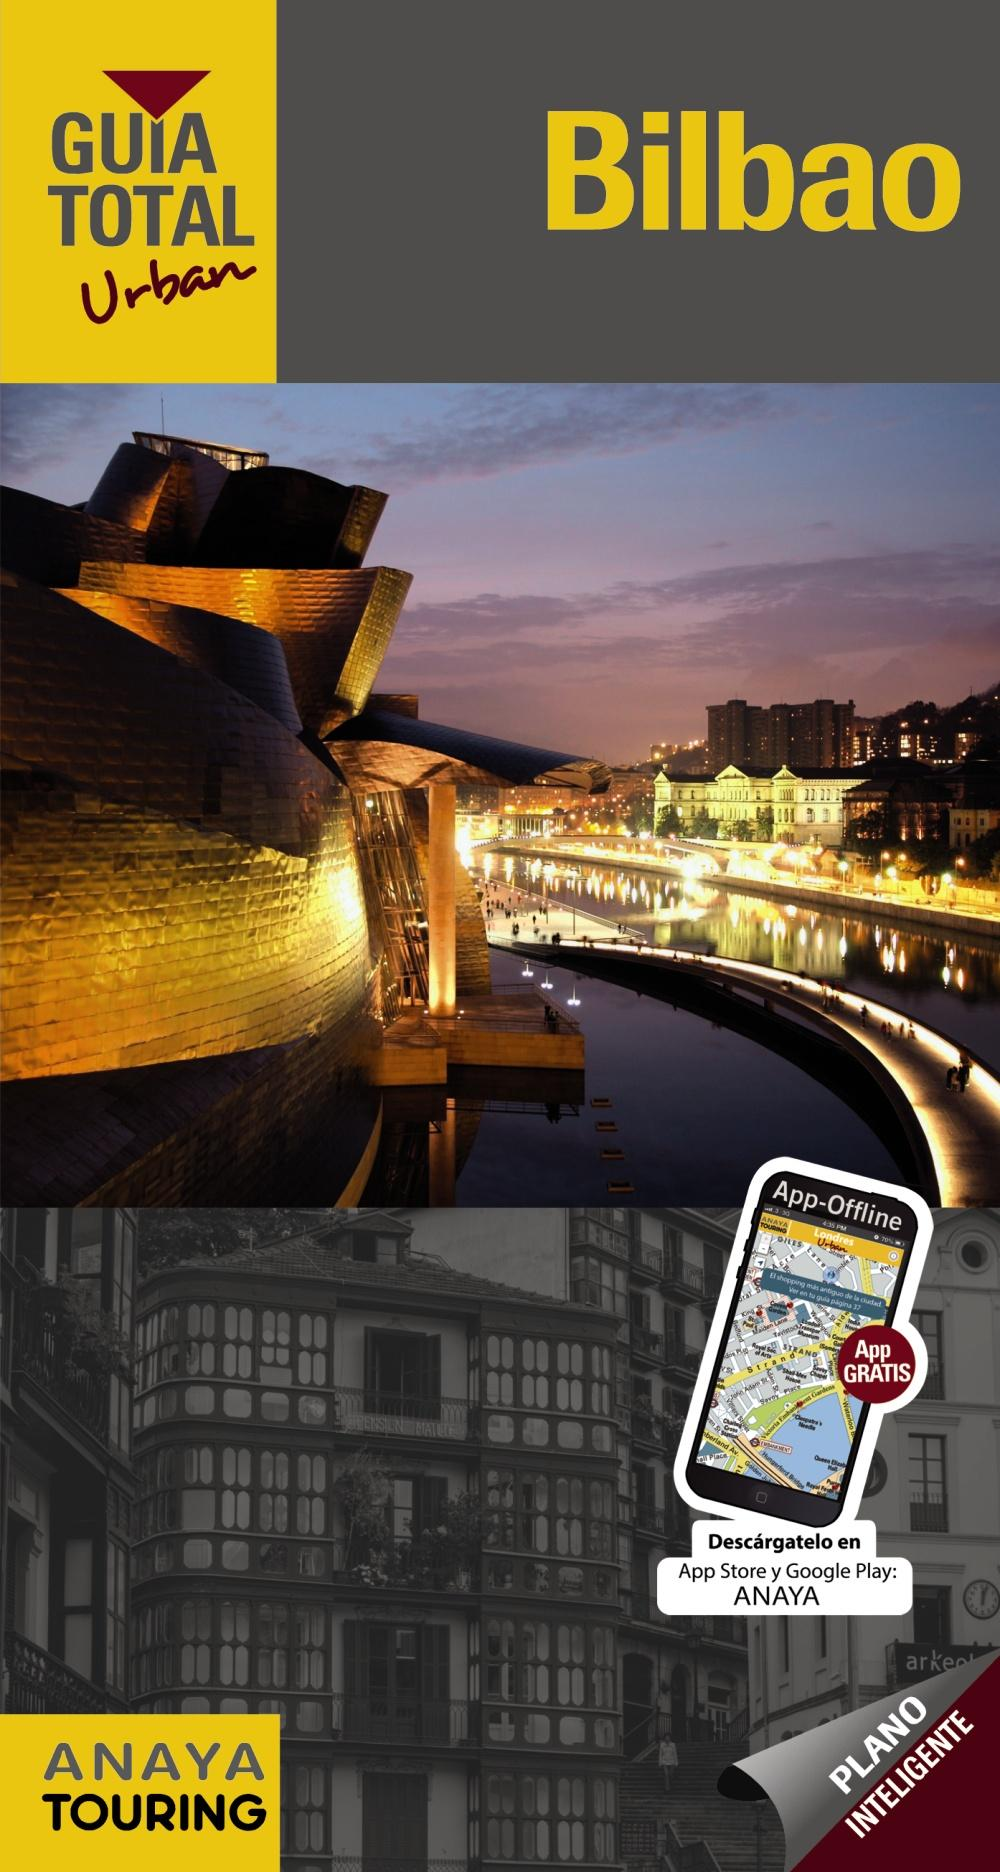 Bilbao (Urban)